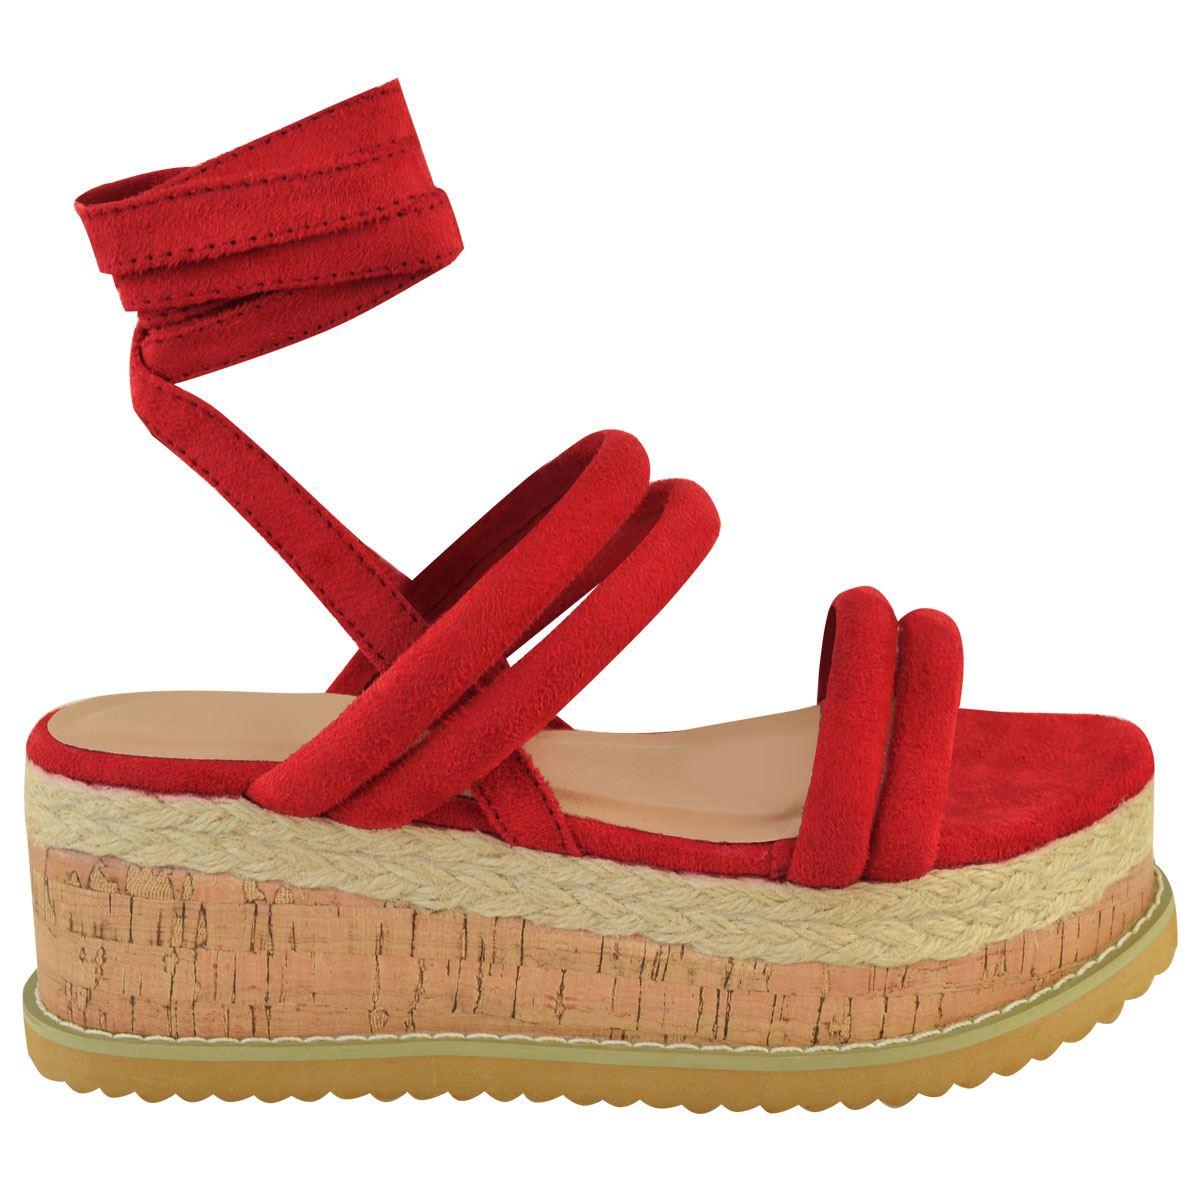 Details about Womens Ladies Lace Up Ribbon Espadrilles Wedge Flatforms Flat Sandals Shoes Size